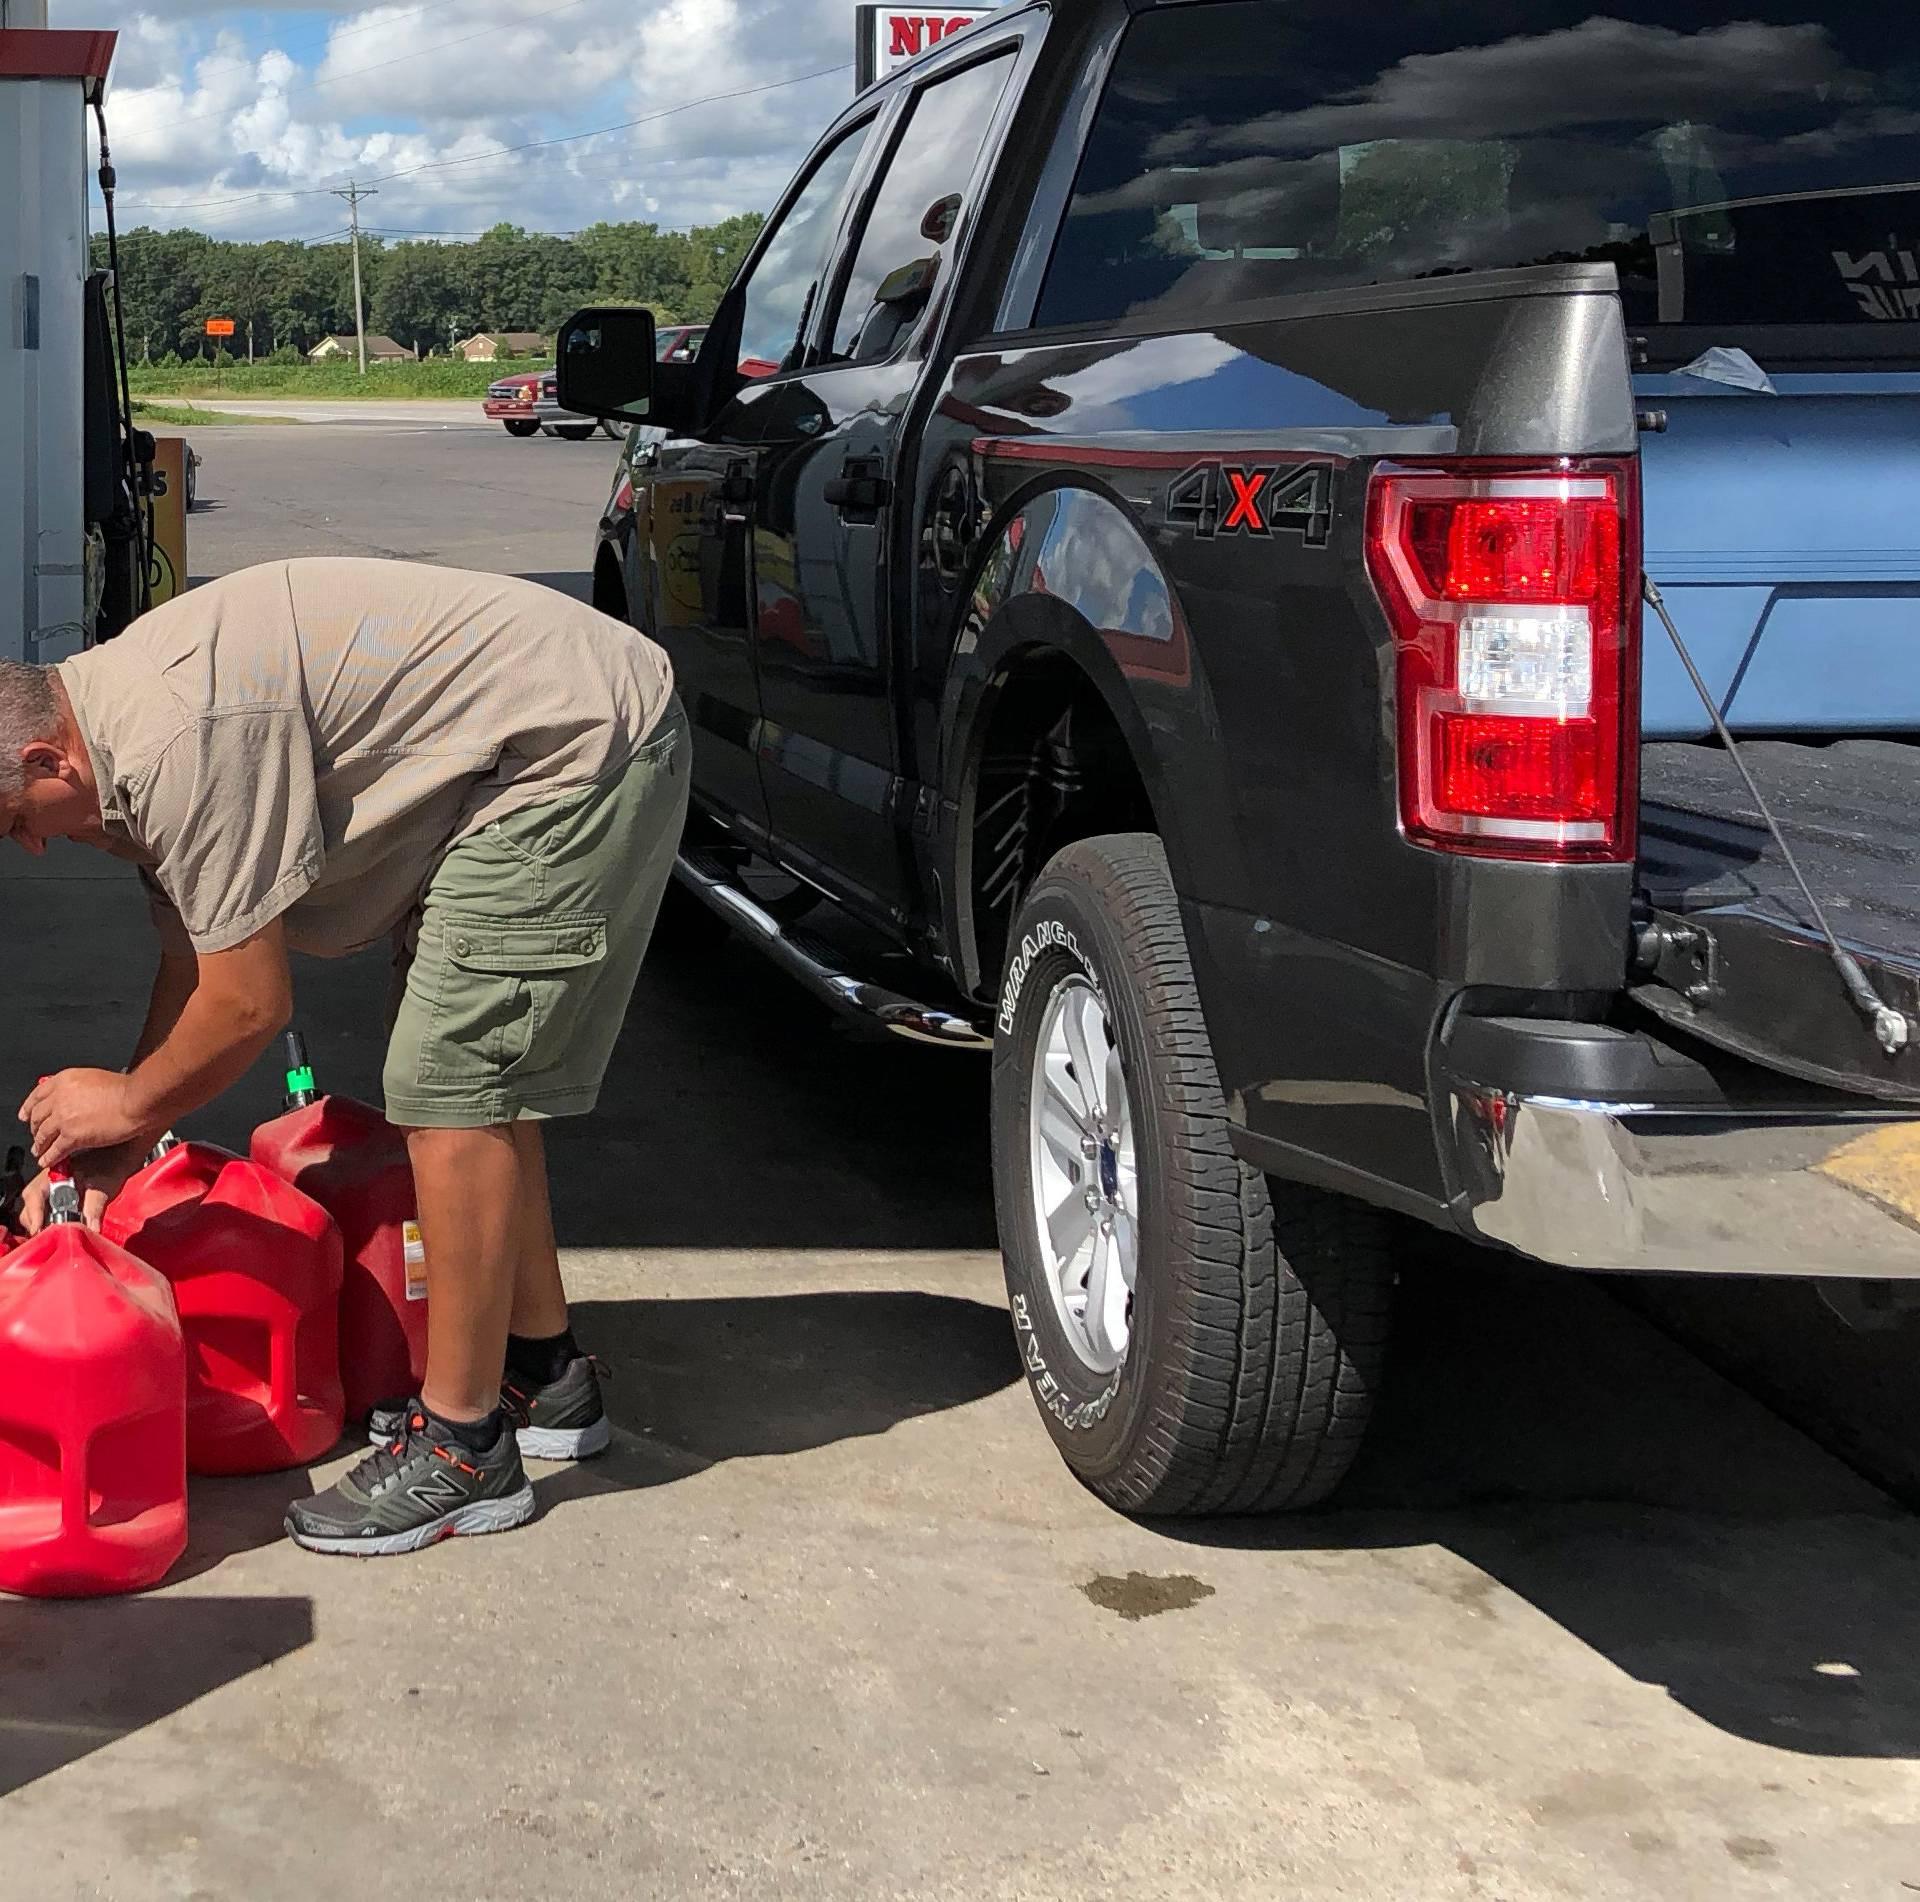 Trent Bullard fills gas containers for his generator ahead of Hurricane Florence in Pembroke North Carolina